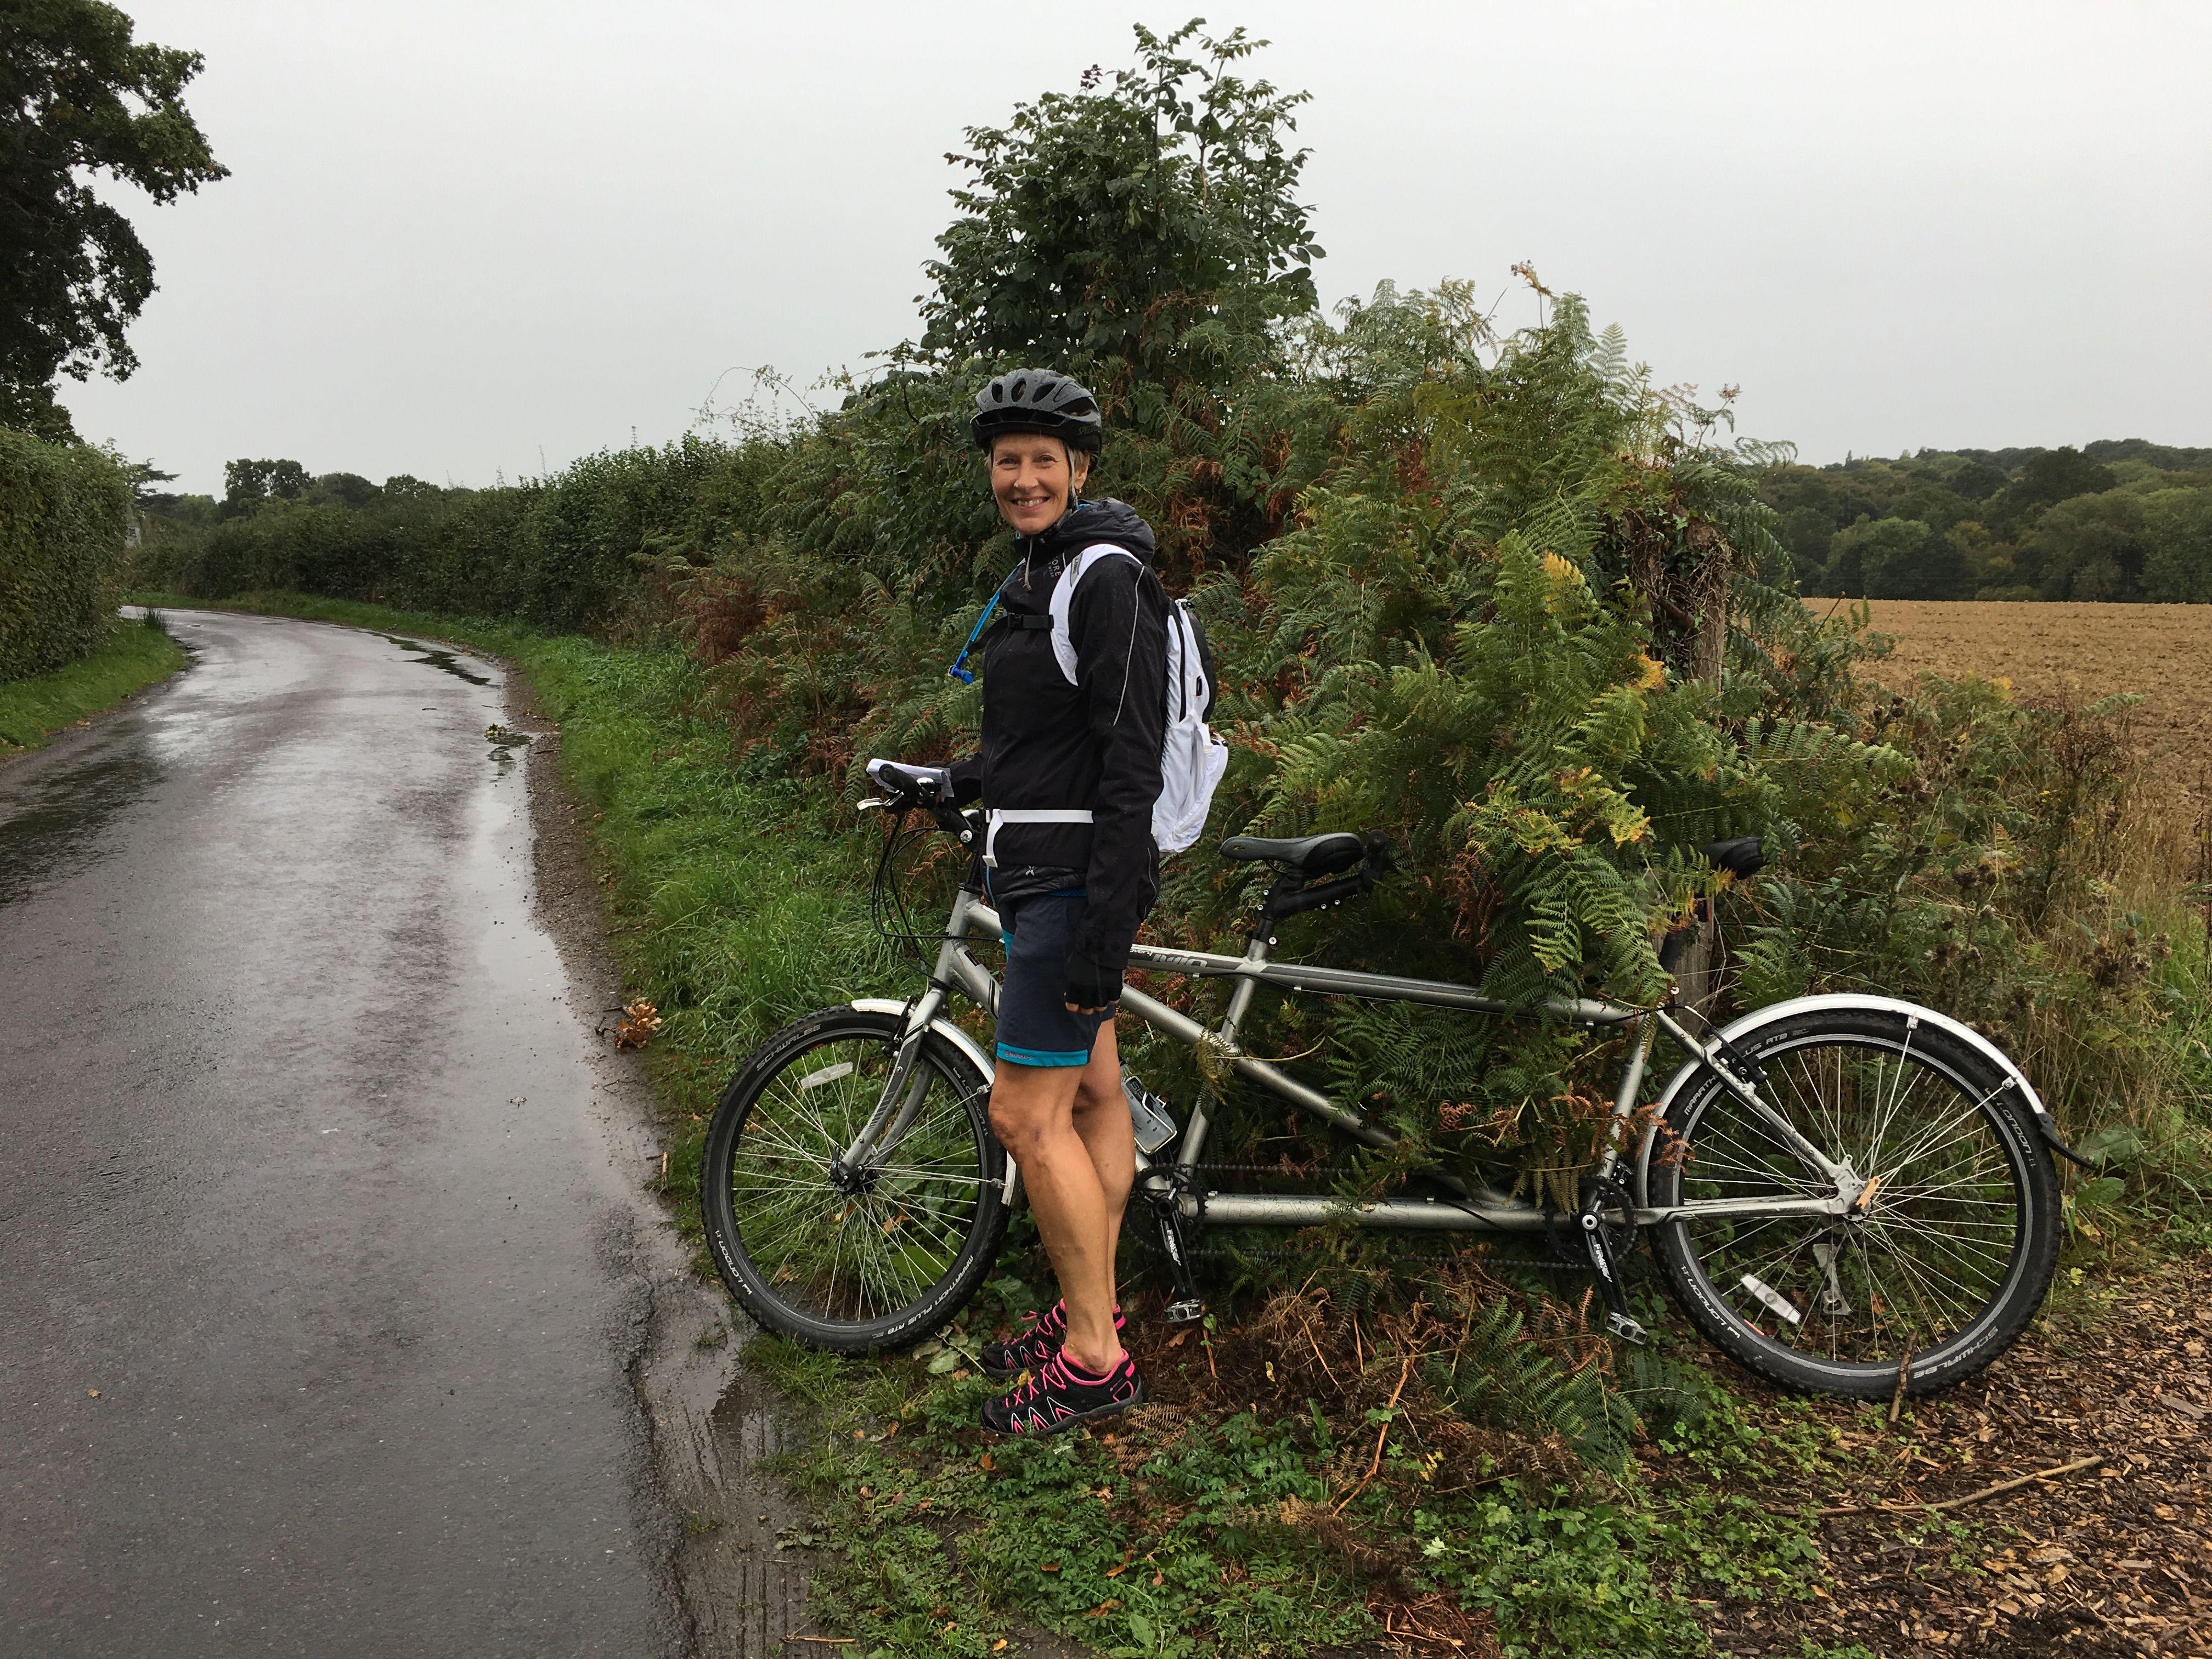 The Art Of Tandem Biking With Images Adventure Bike Tandem